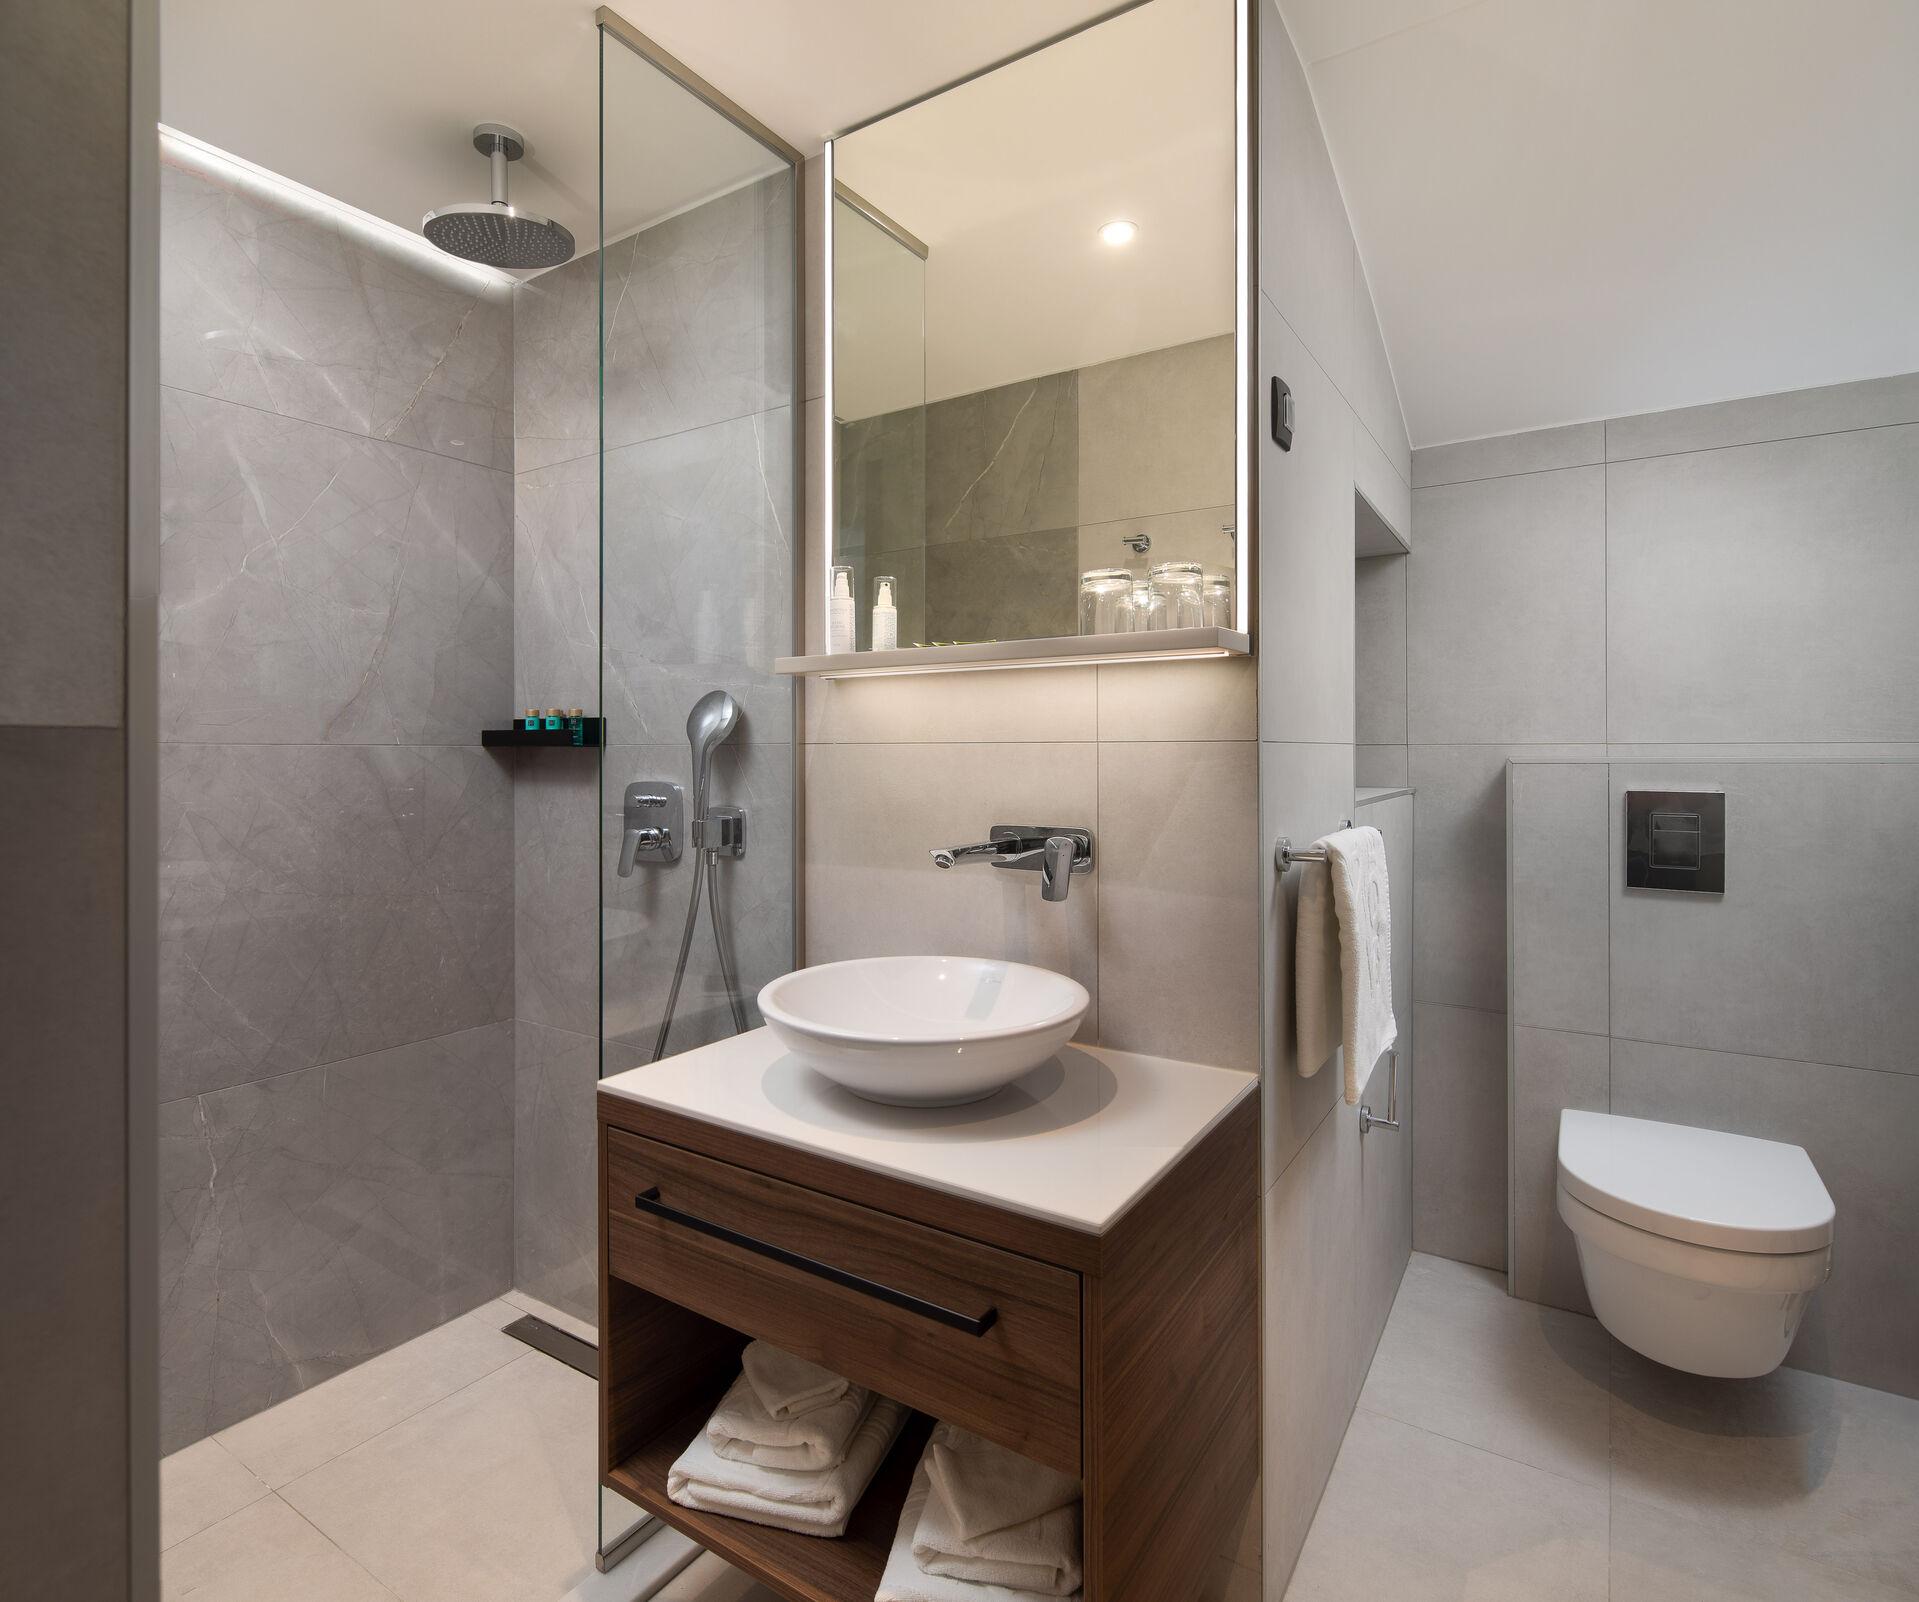 https://cms.satur.sk/data/imgs/tour_image/orig/bathroom_hotel-noemia-3-1949940.jpg